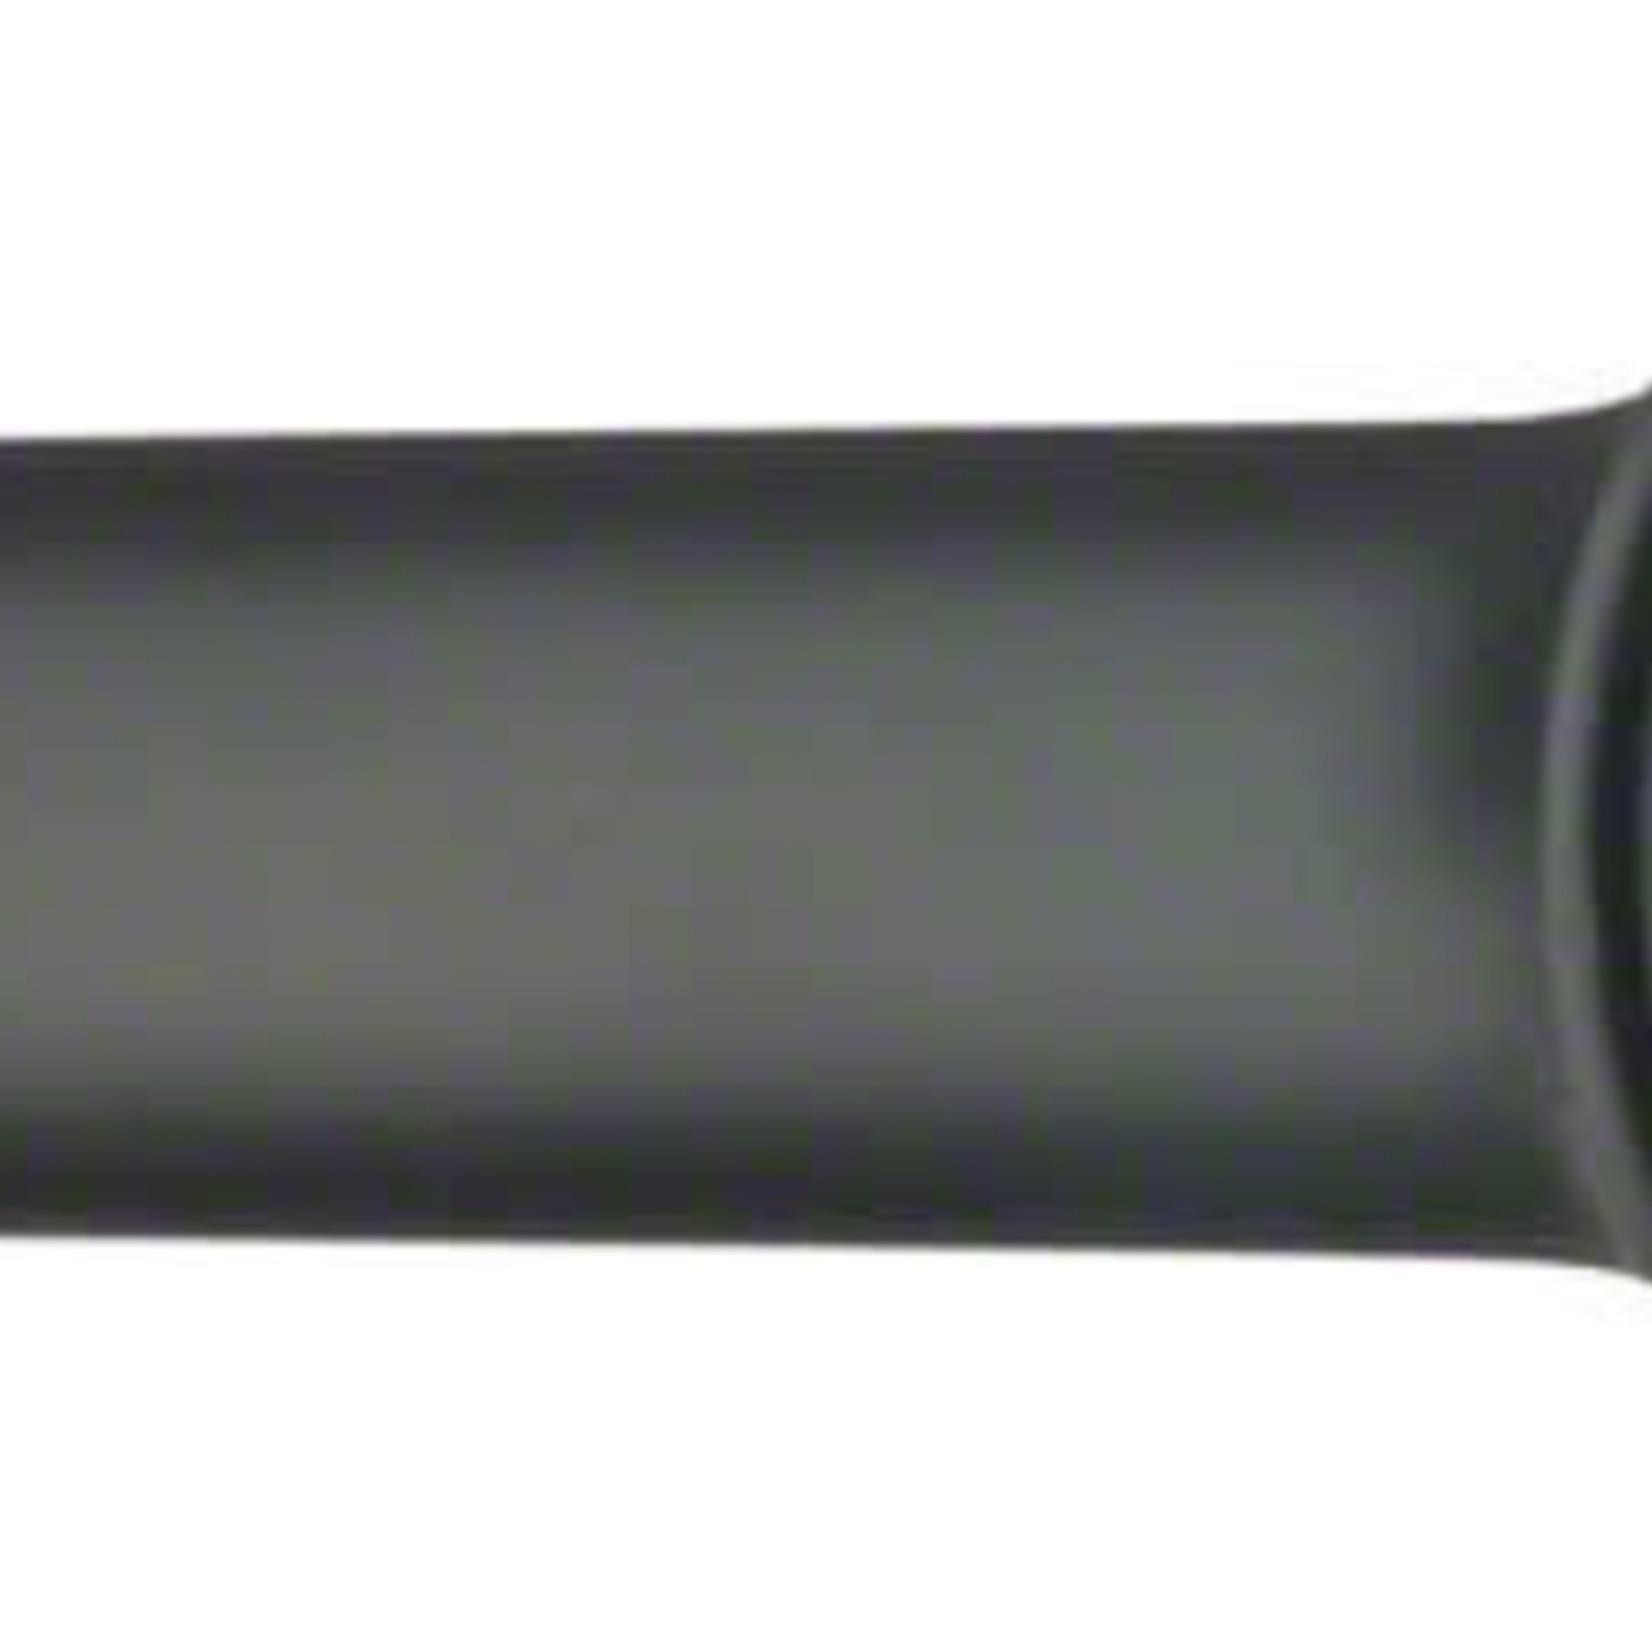 "STEM Dimension Steerer Adaptor 1"" quill to 1-1/8"" Threadless Black"